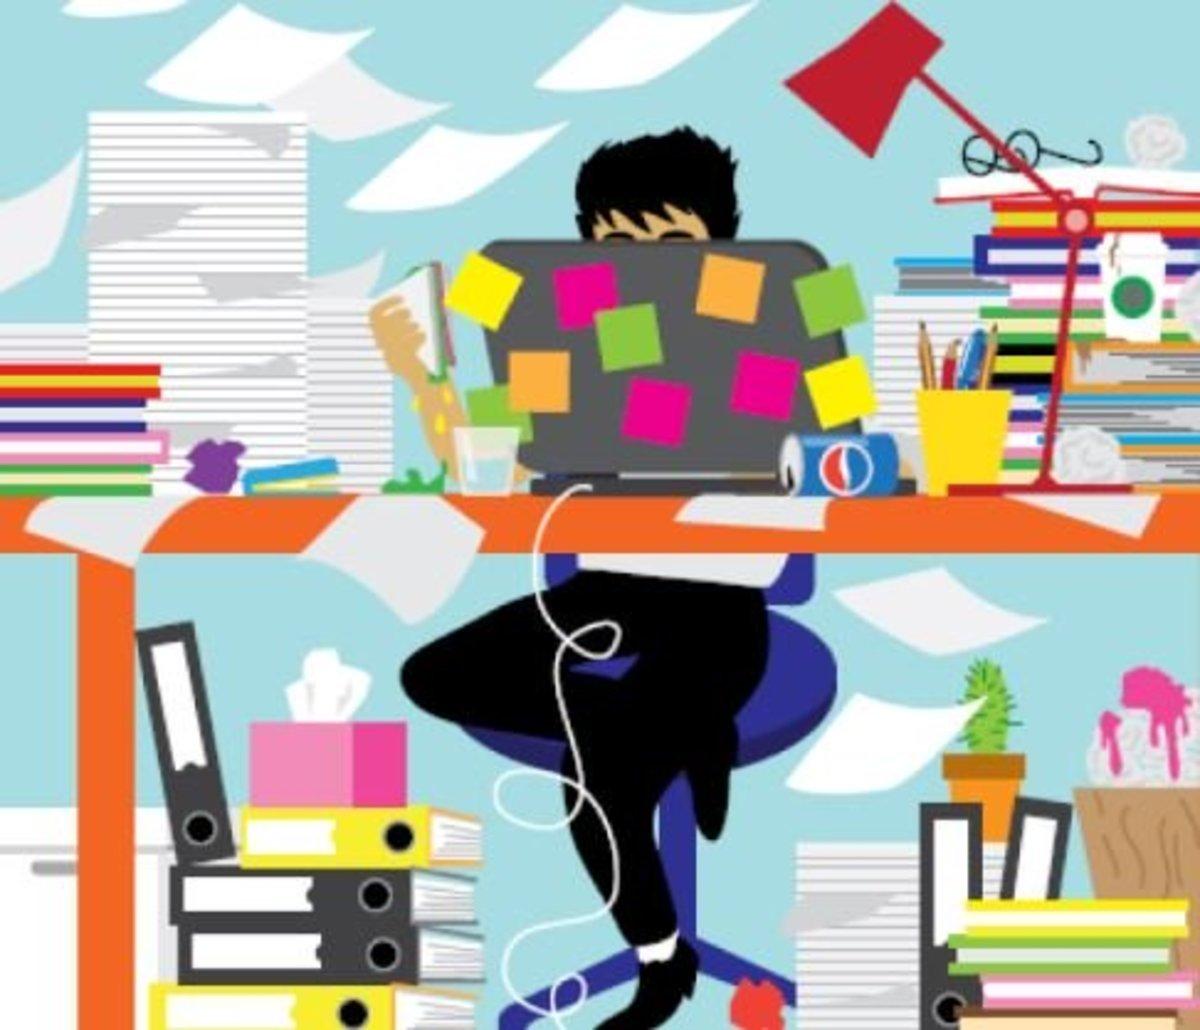 Increased stress at work